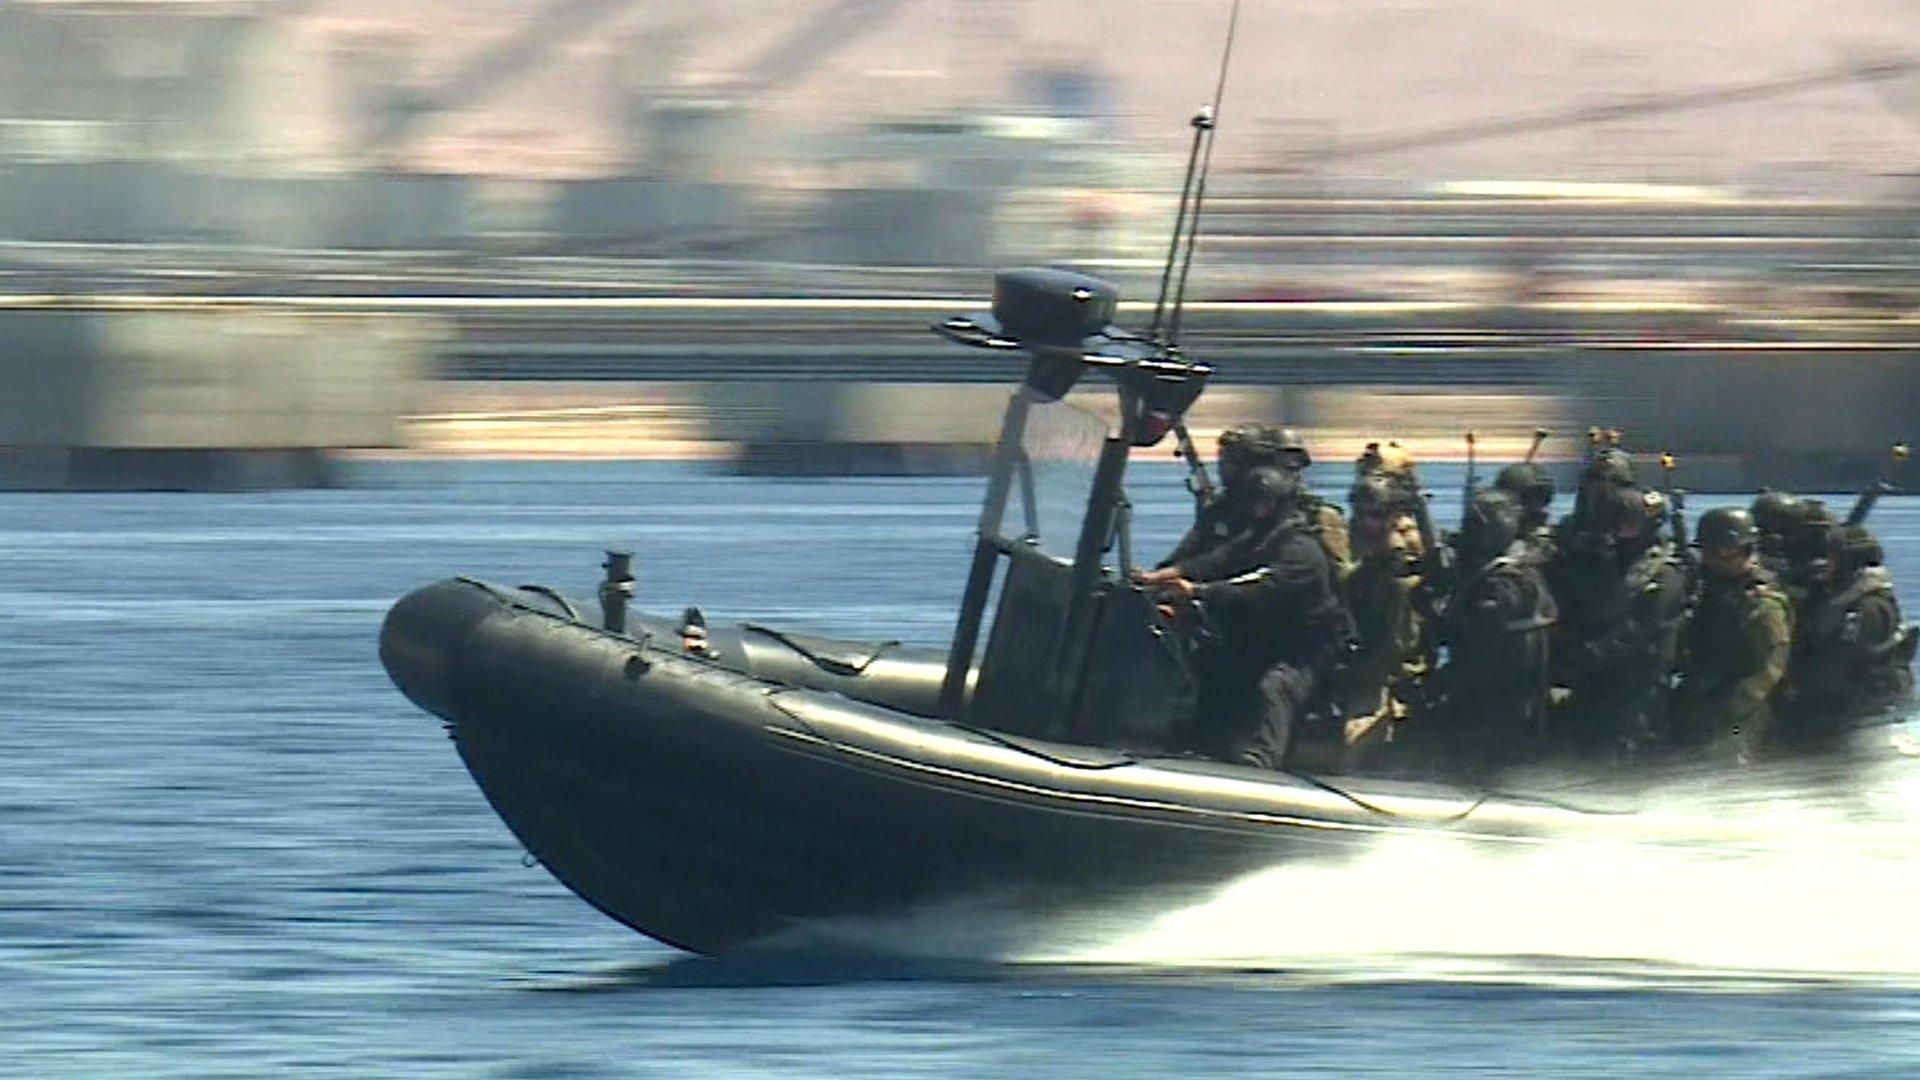 Special forces in boat, Jordan